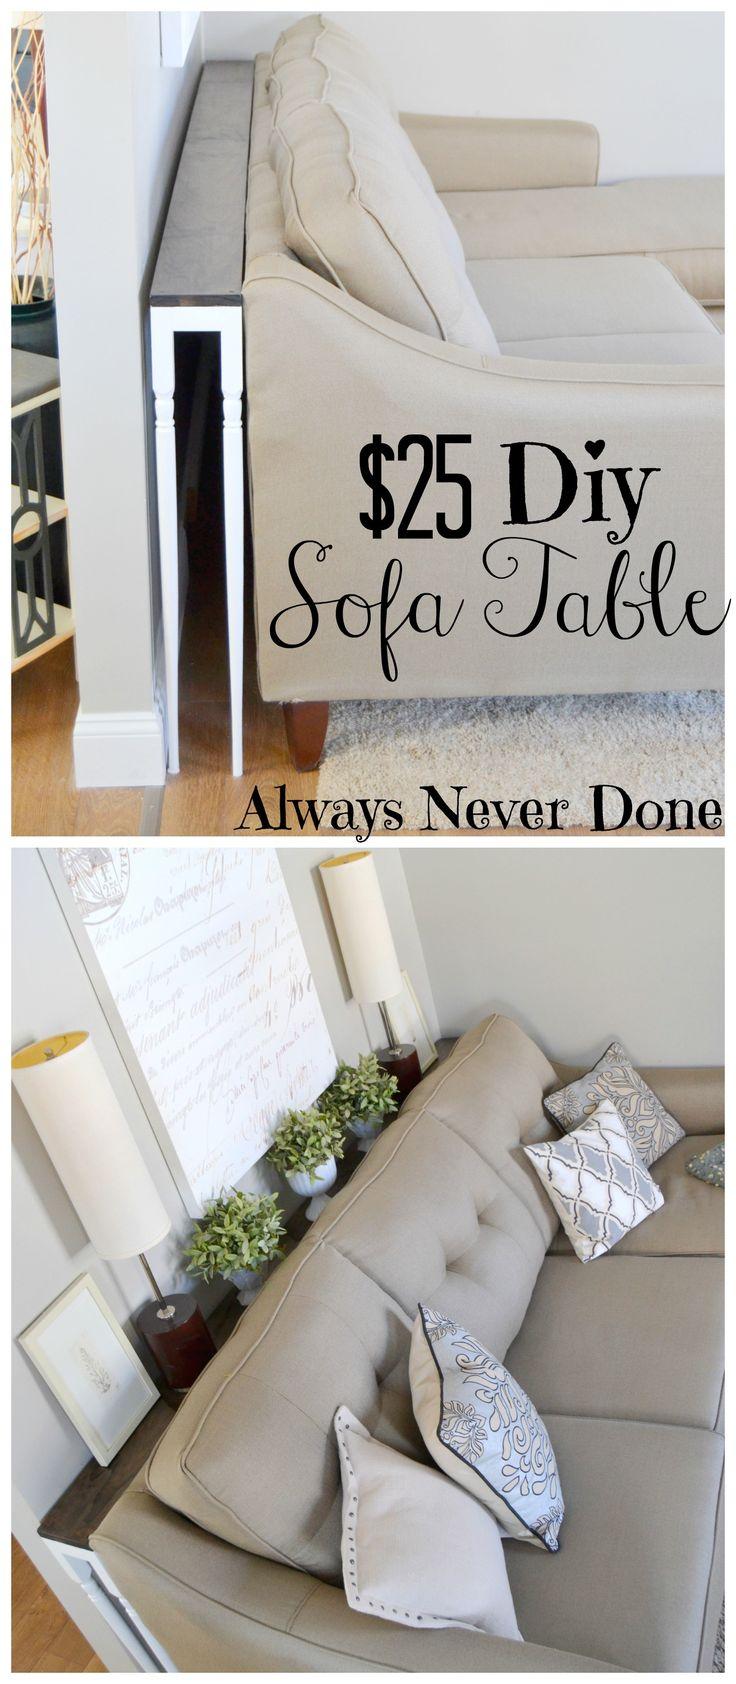 DIY Sofa Table for $25 using stair rails as legs.